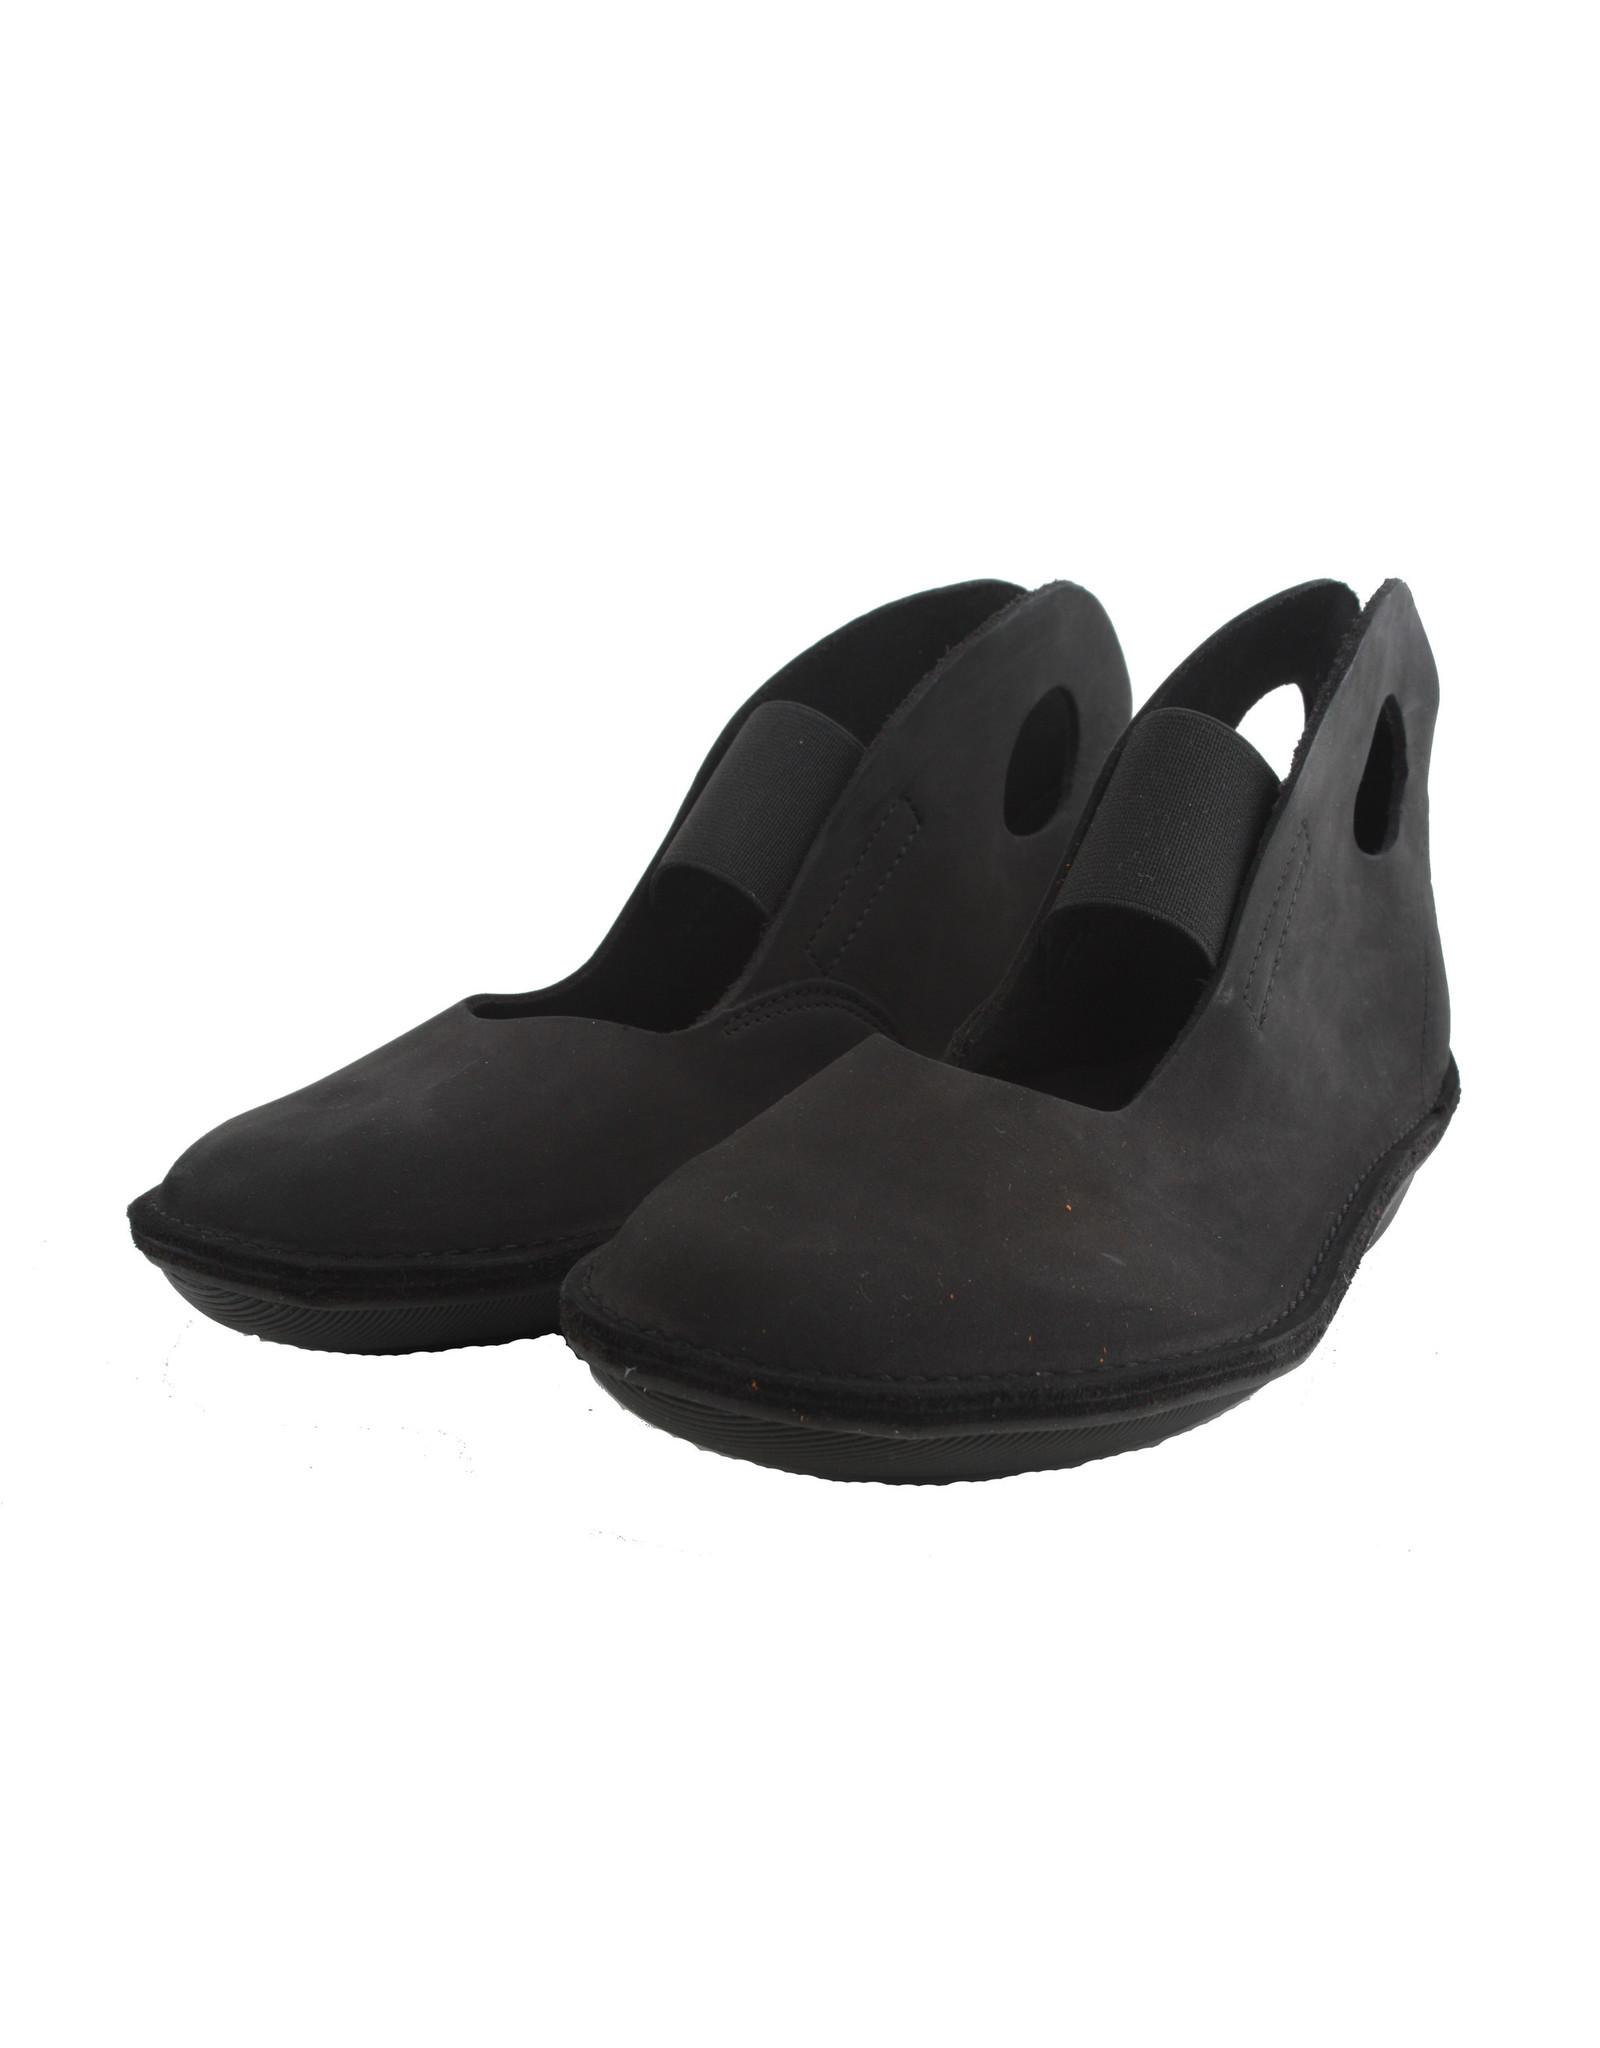 Loints Turbo 39031 784 black